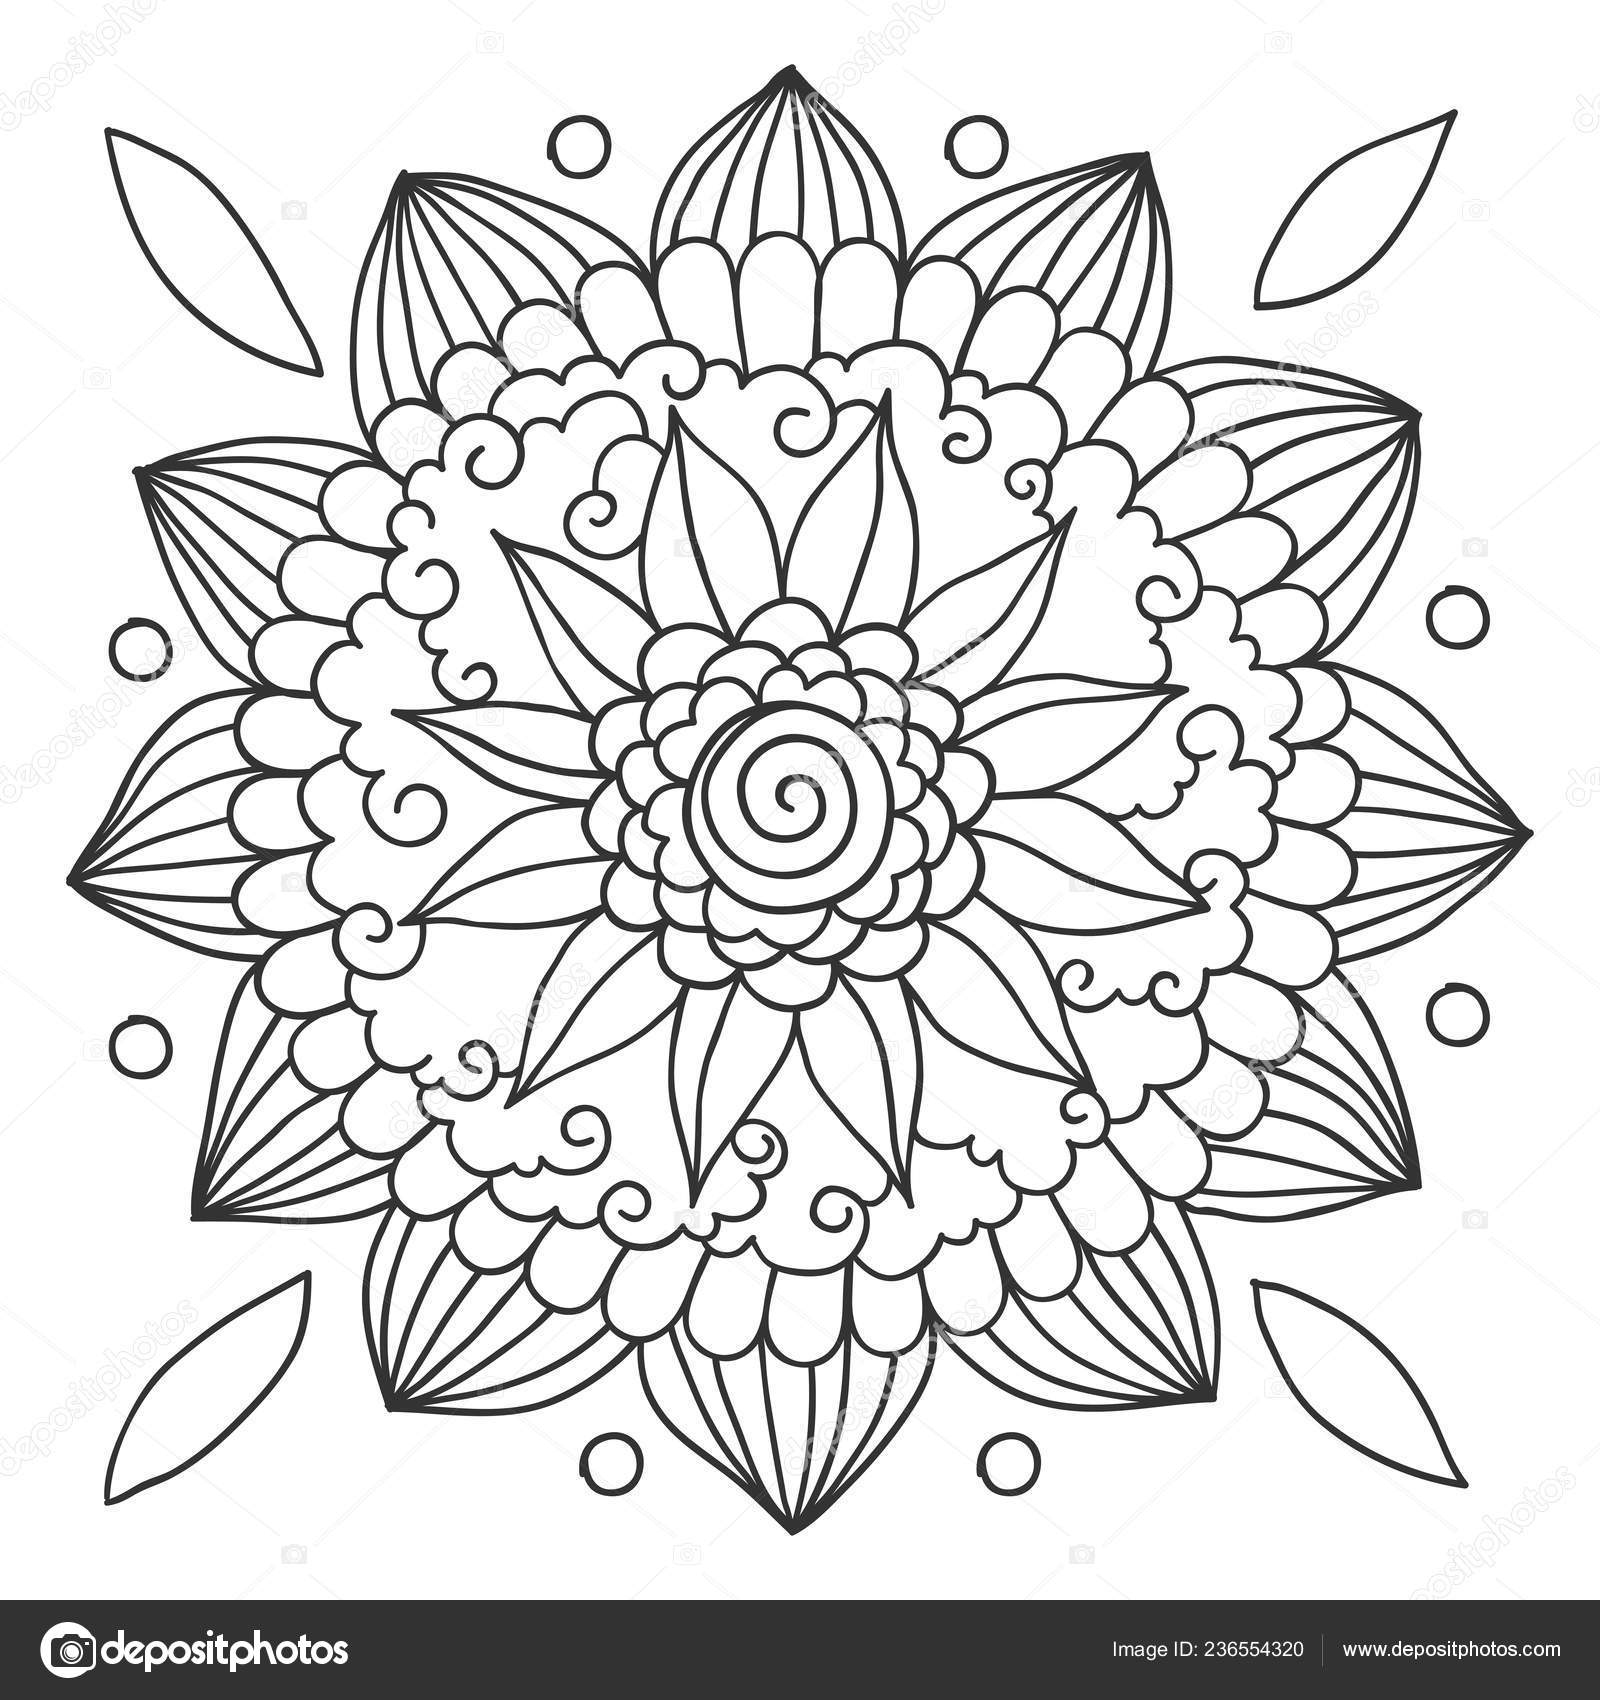 Floral Mandala Coloring Pages Hand Drawn Floral Mandala Coloring